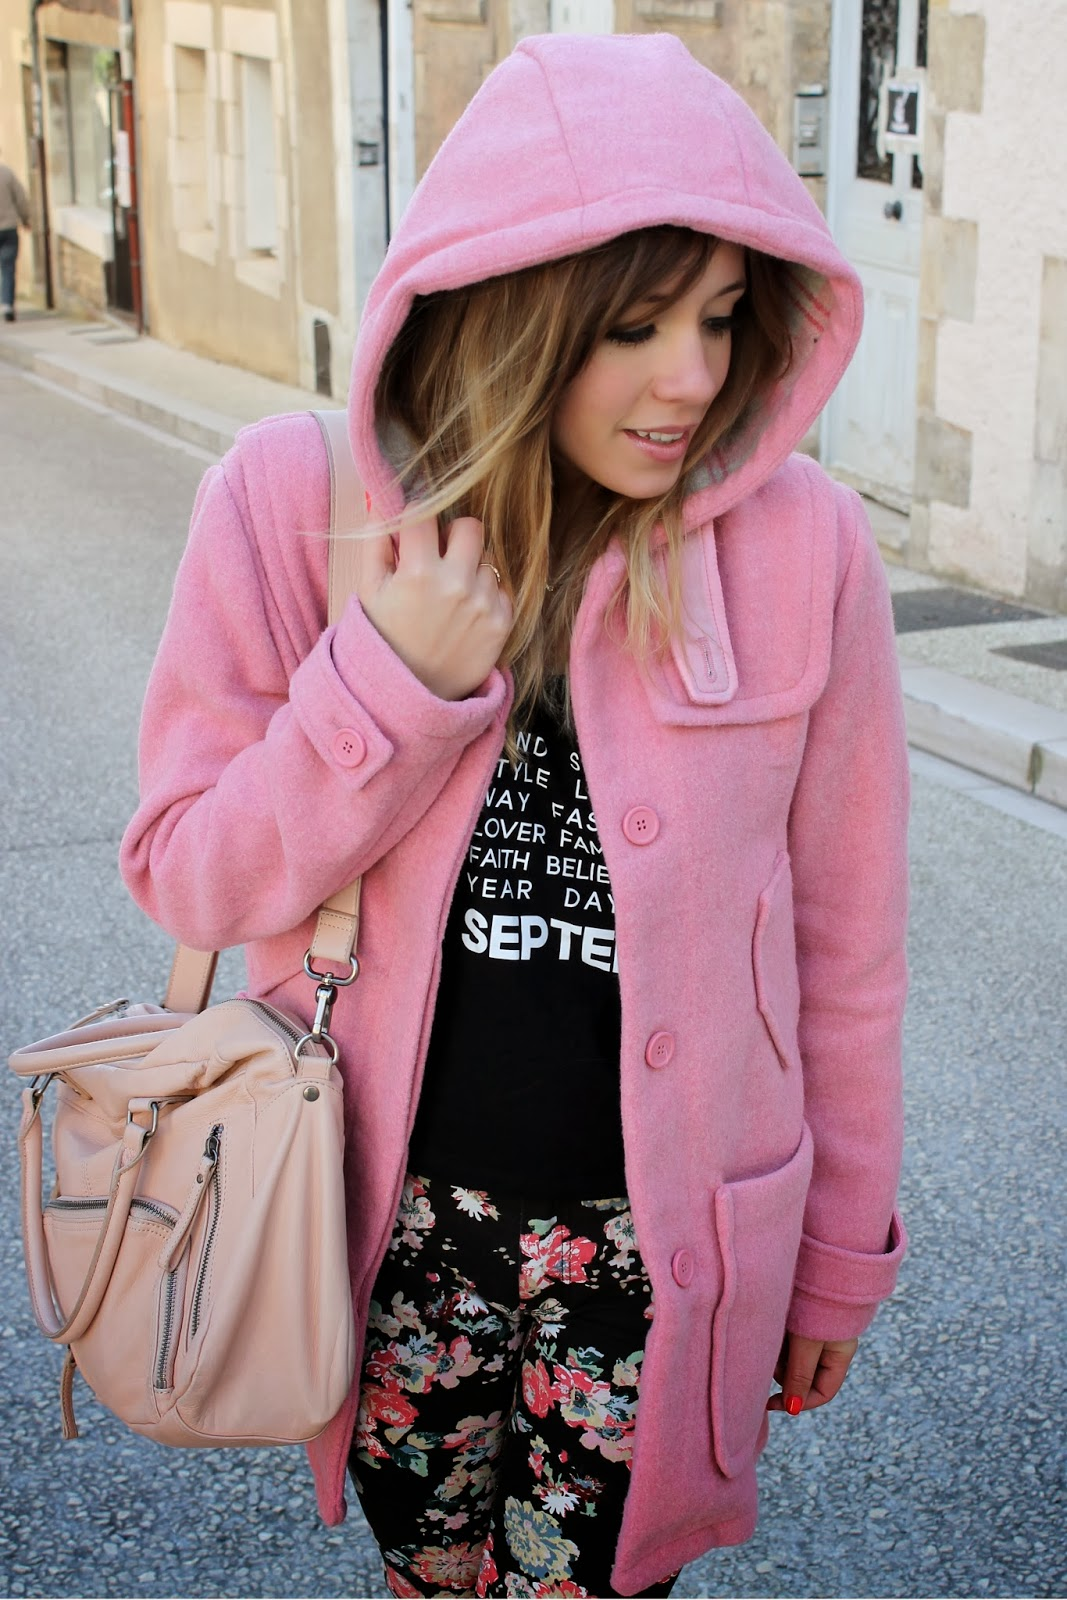 Manteau hiver tendance rose